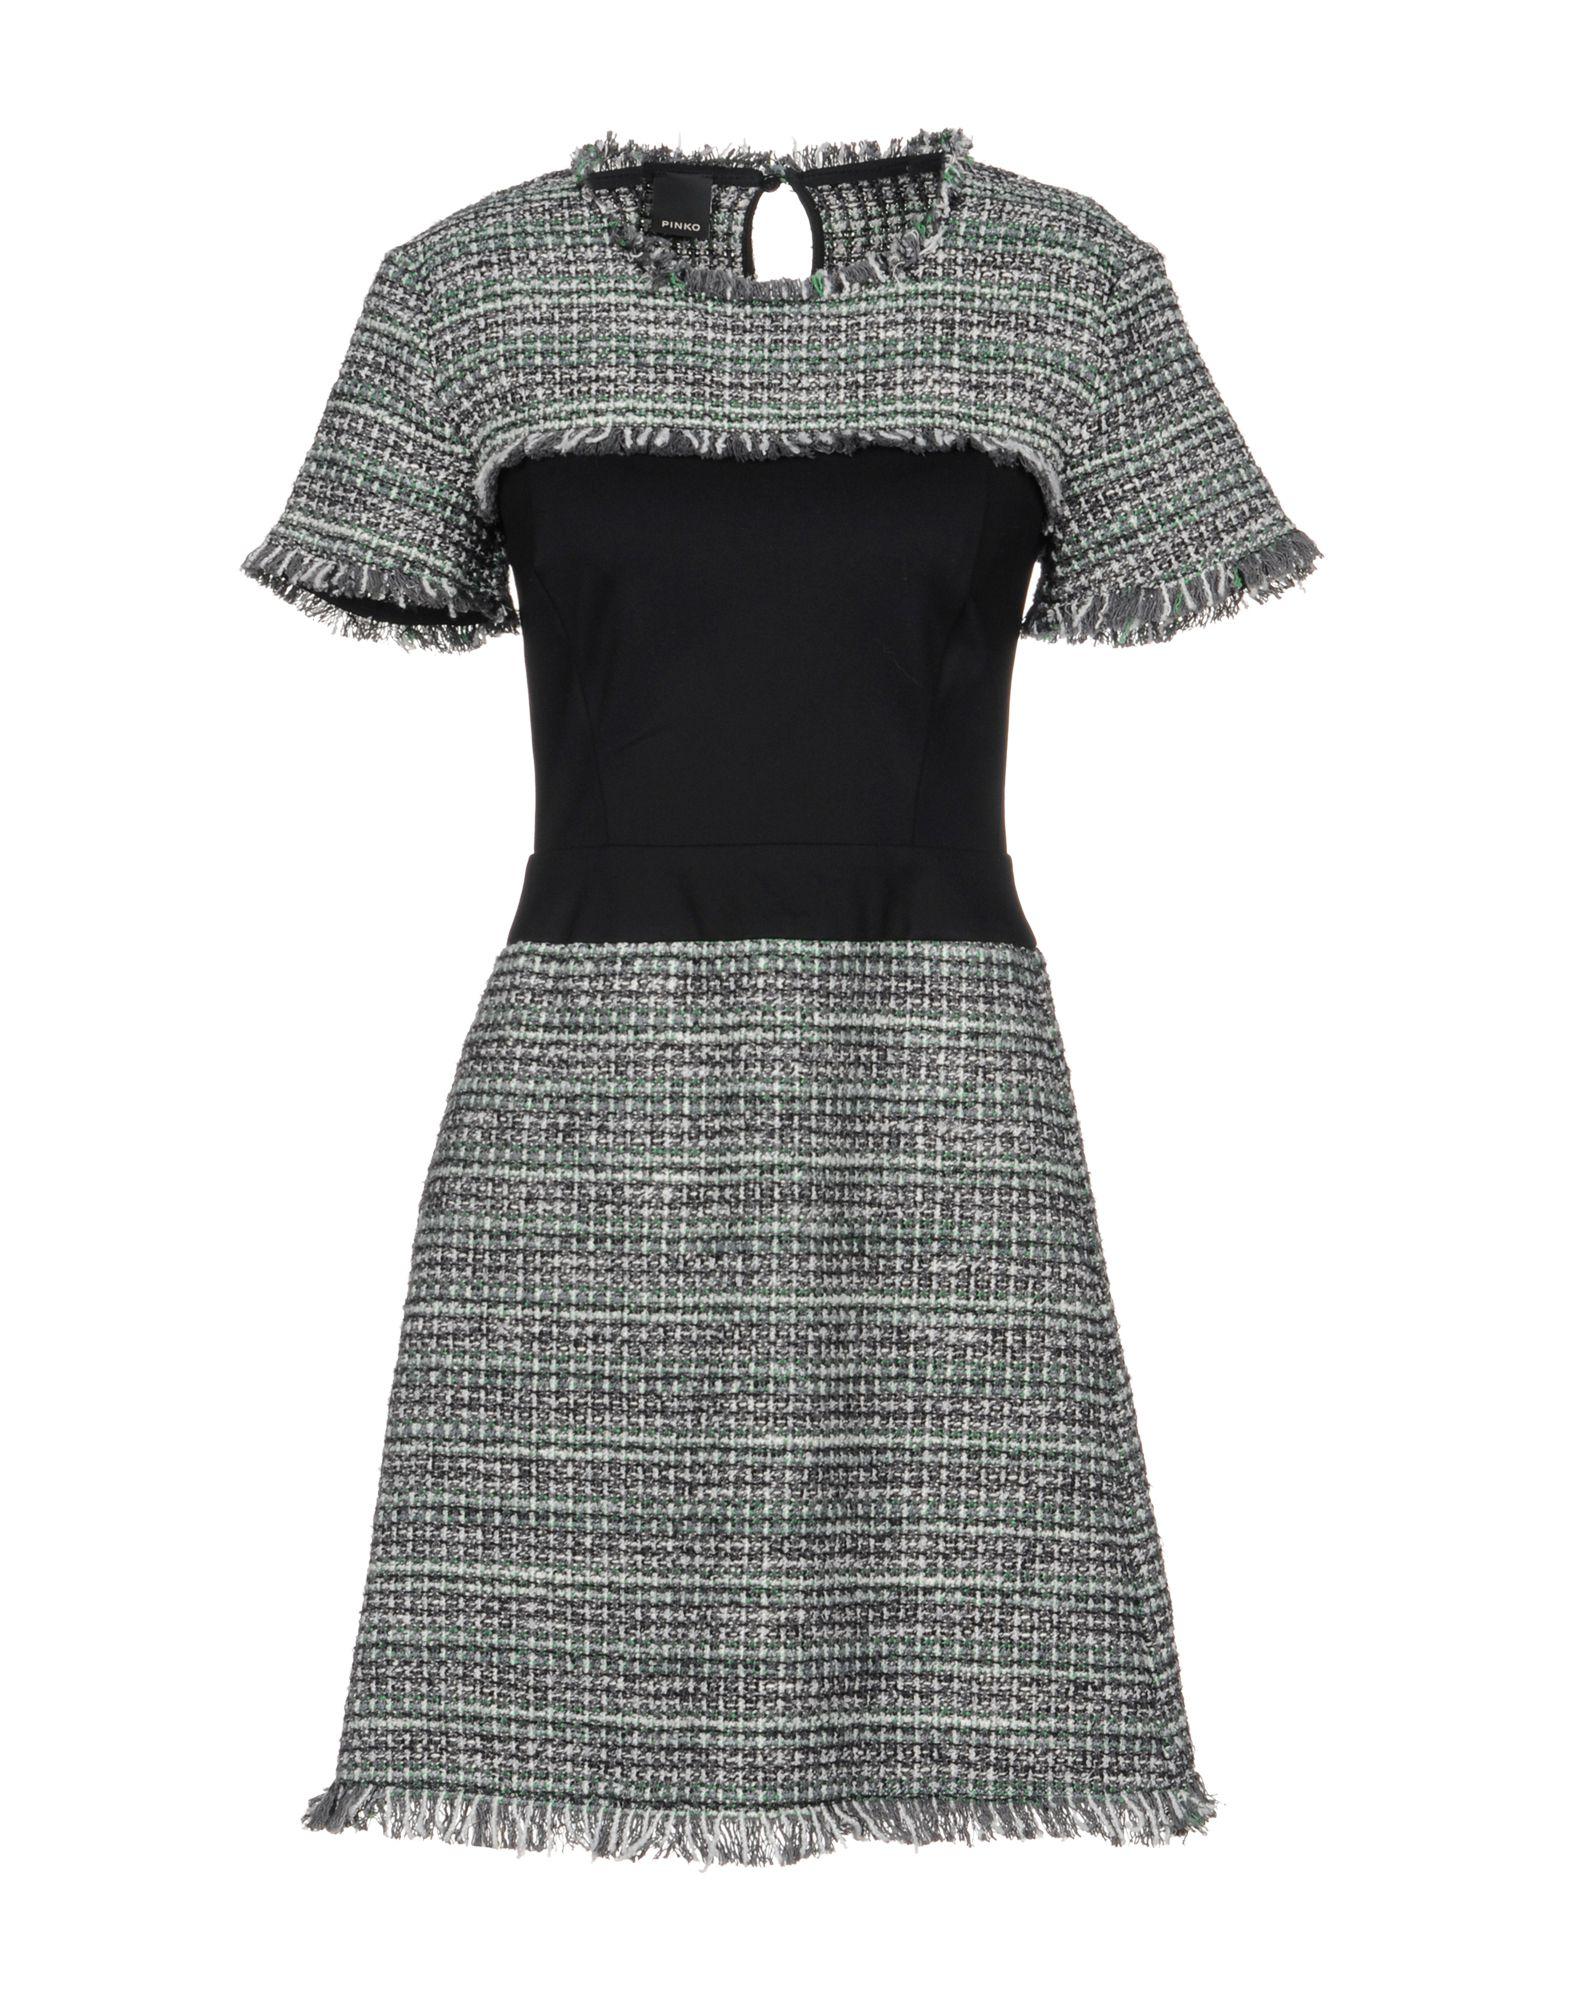 c6f155b075 Pinko Short Dress - Women Pinko Short Dresses online on YOOX Bulgaria -  34850691RE